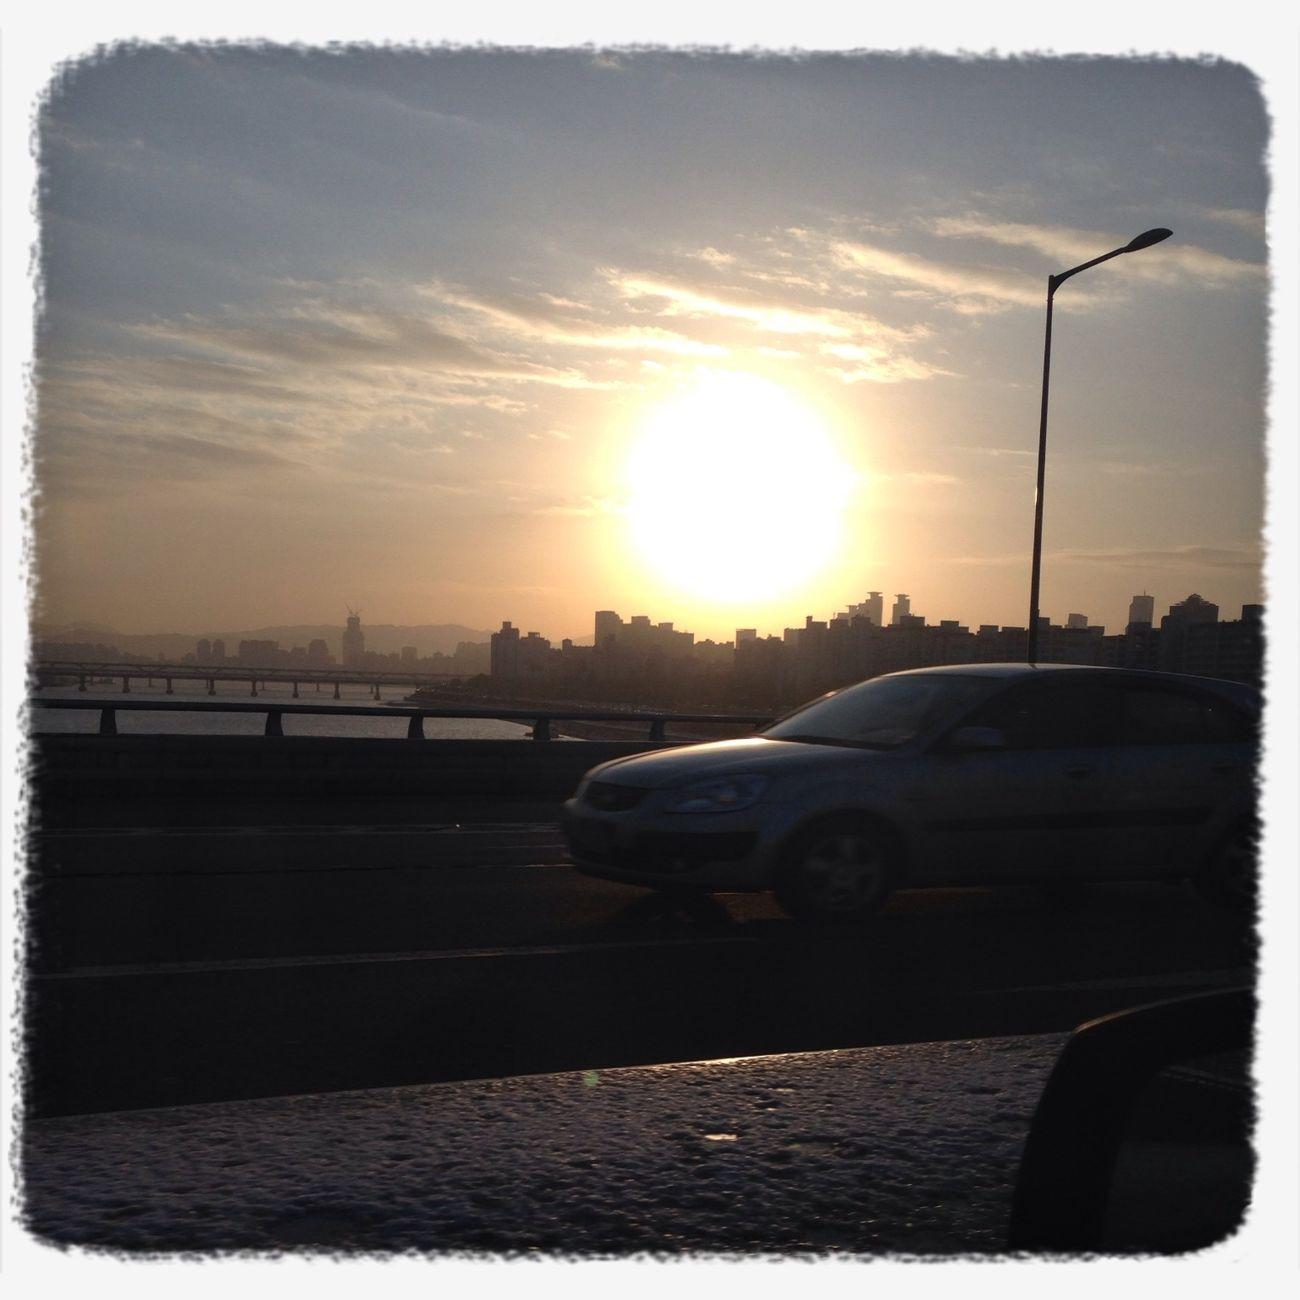 Sunrise at Seoul